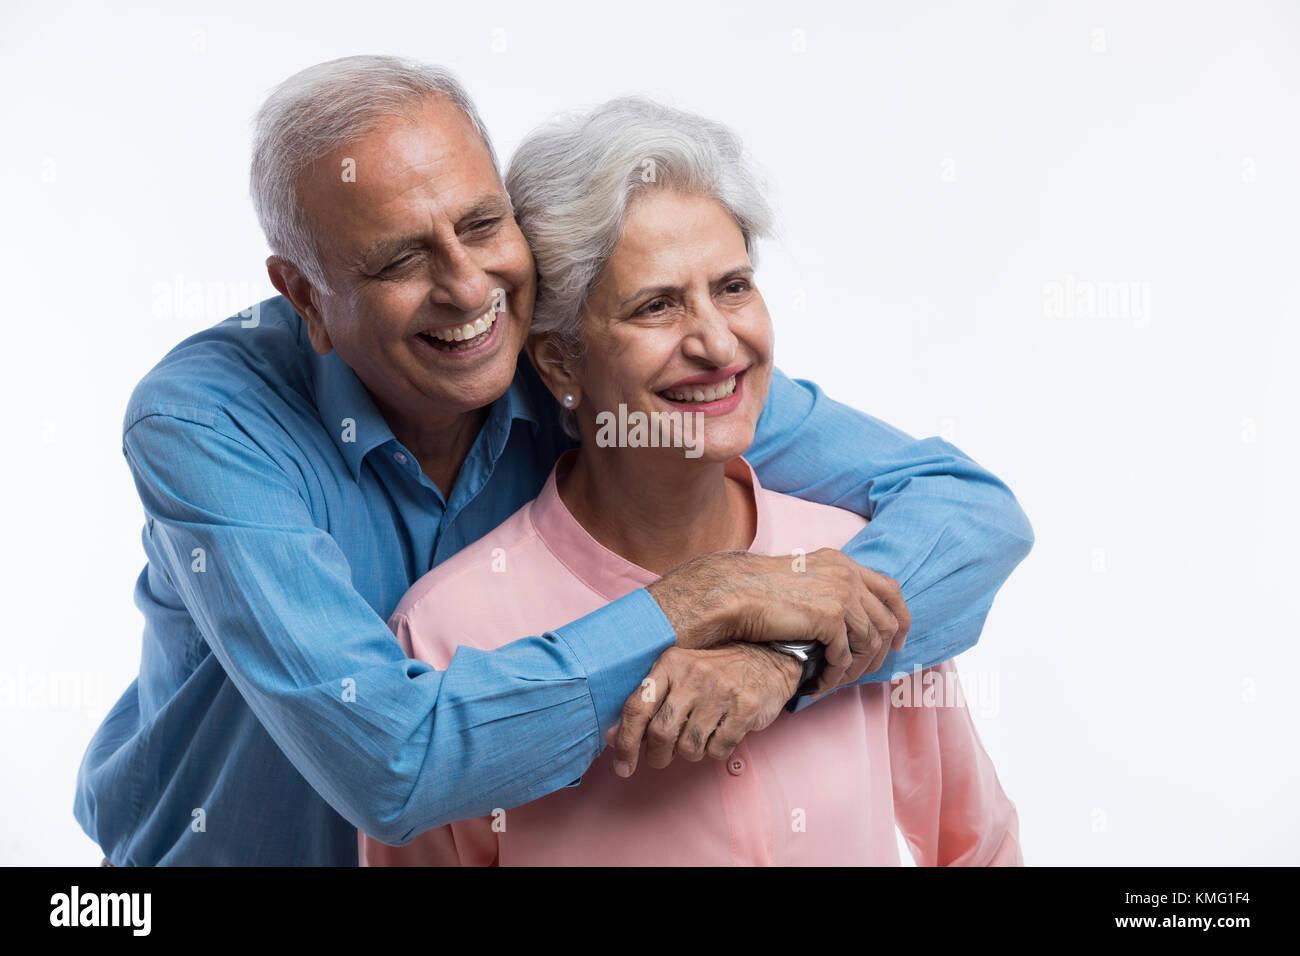 Portrait of senior couple - Stock Image